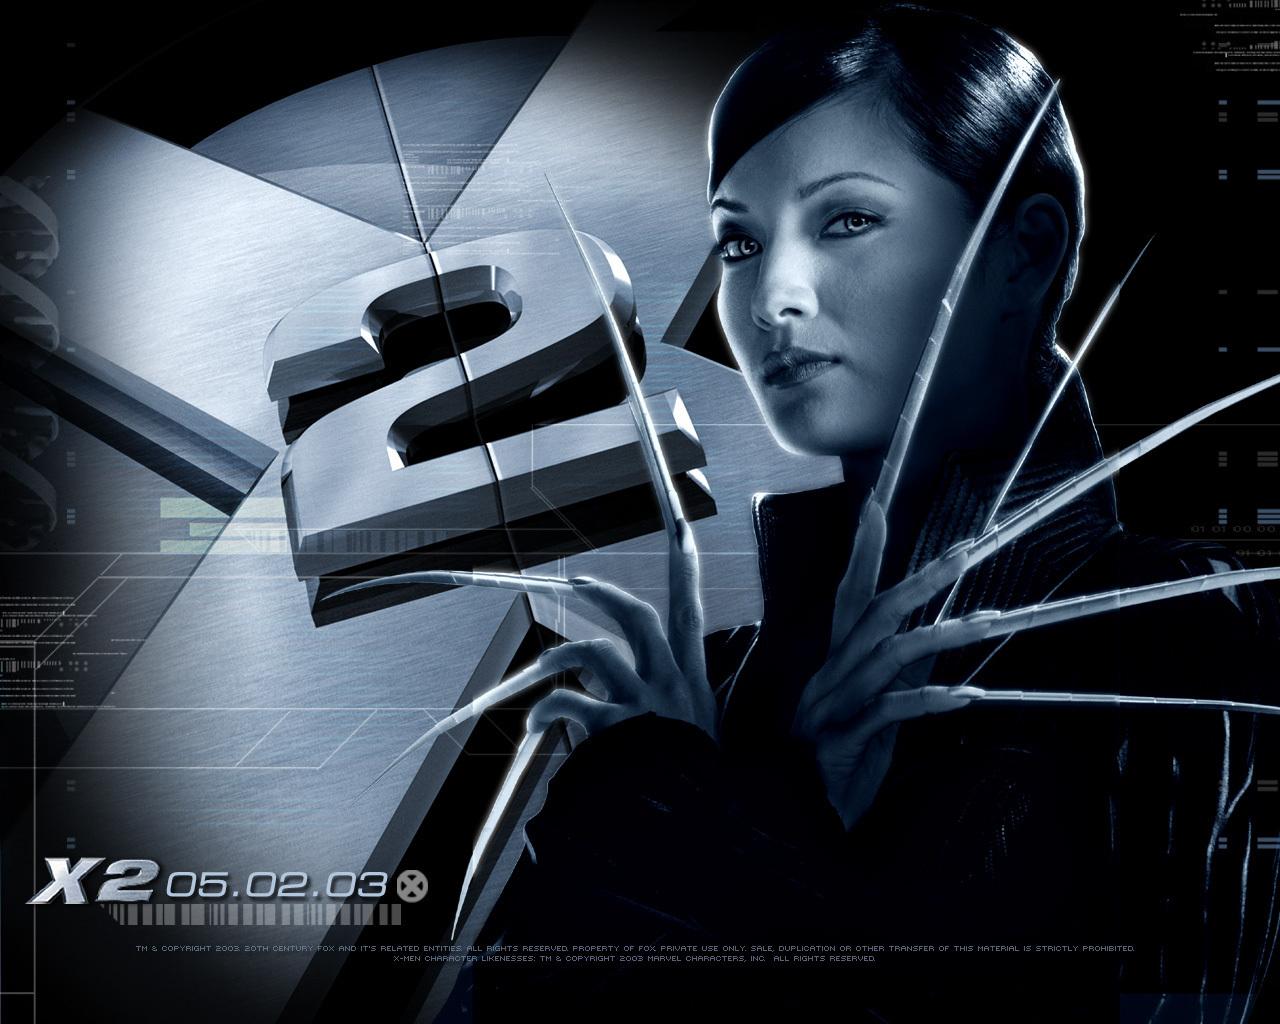 X2 wallpapers - X-men THE MOVIE Wallpaper (6889384) - Fanpop  X Men 2 Movie Wallpaper